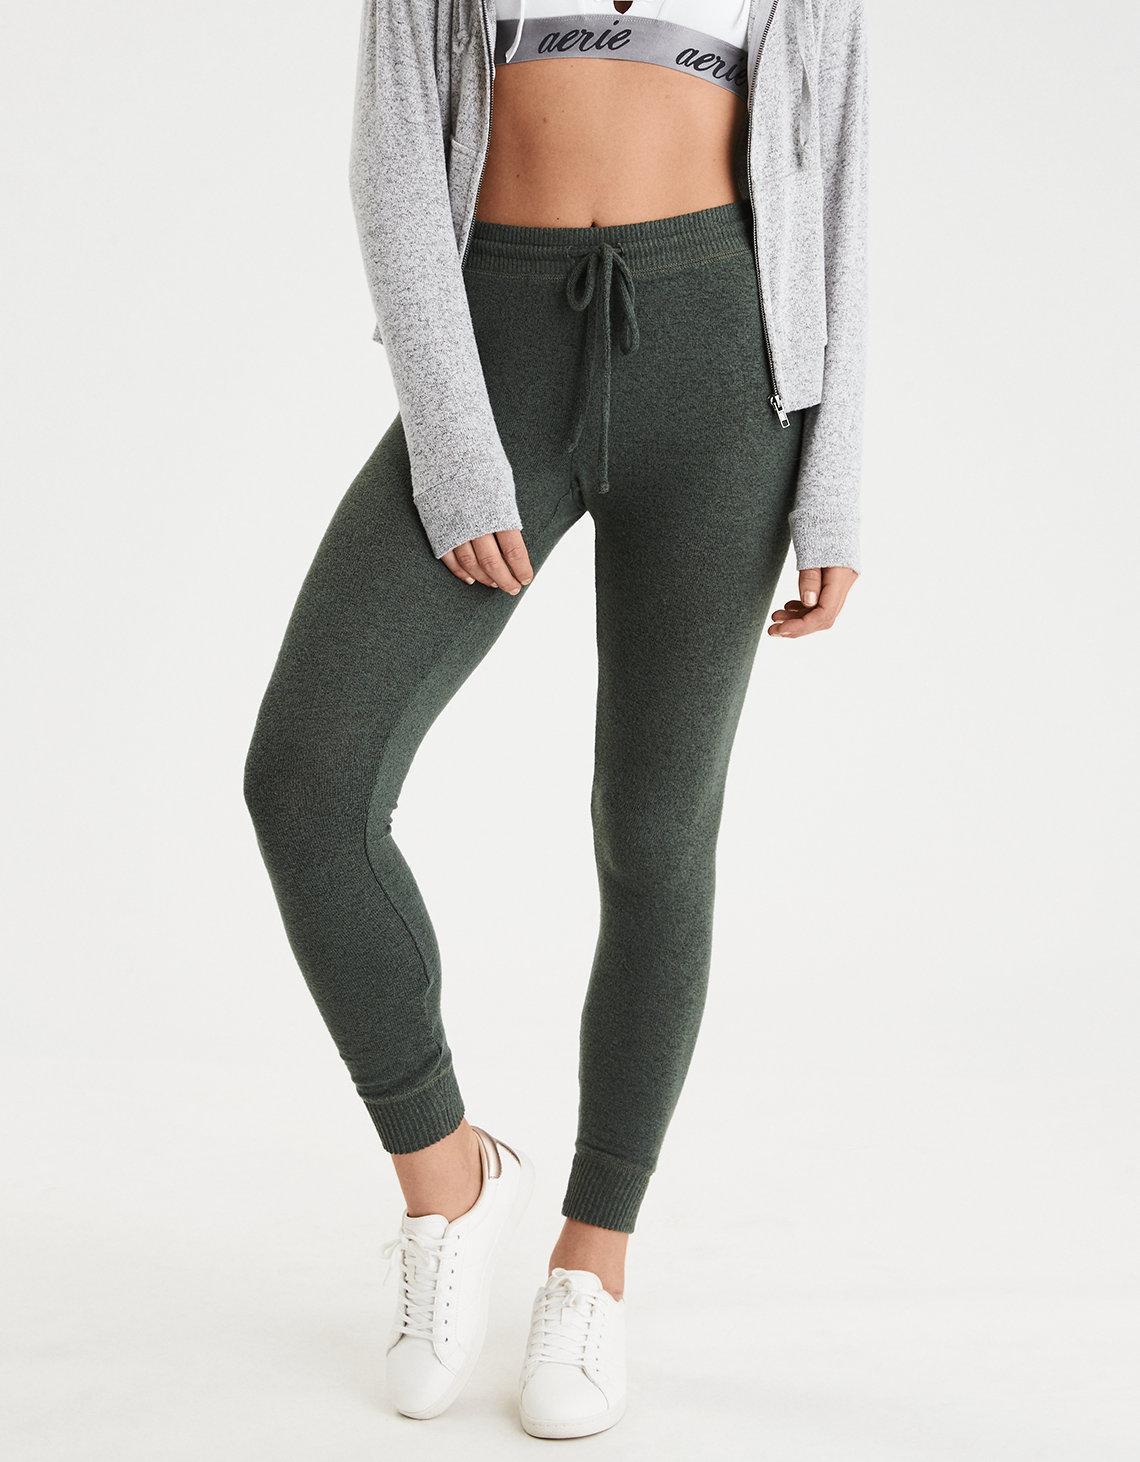 73345d6247ae1 American Eagle Plush Sweater Legging in Green - Lyst